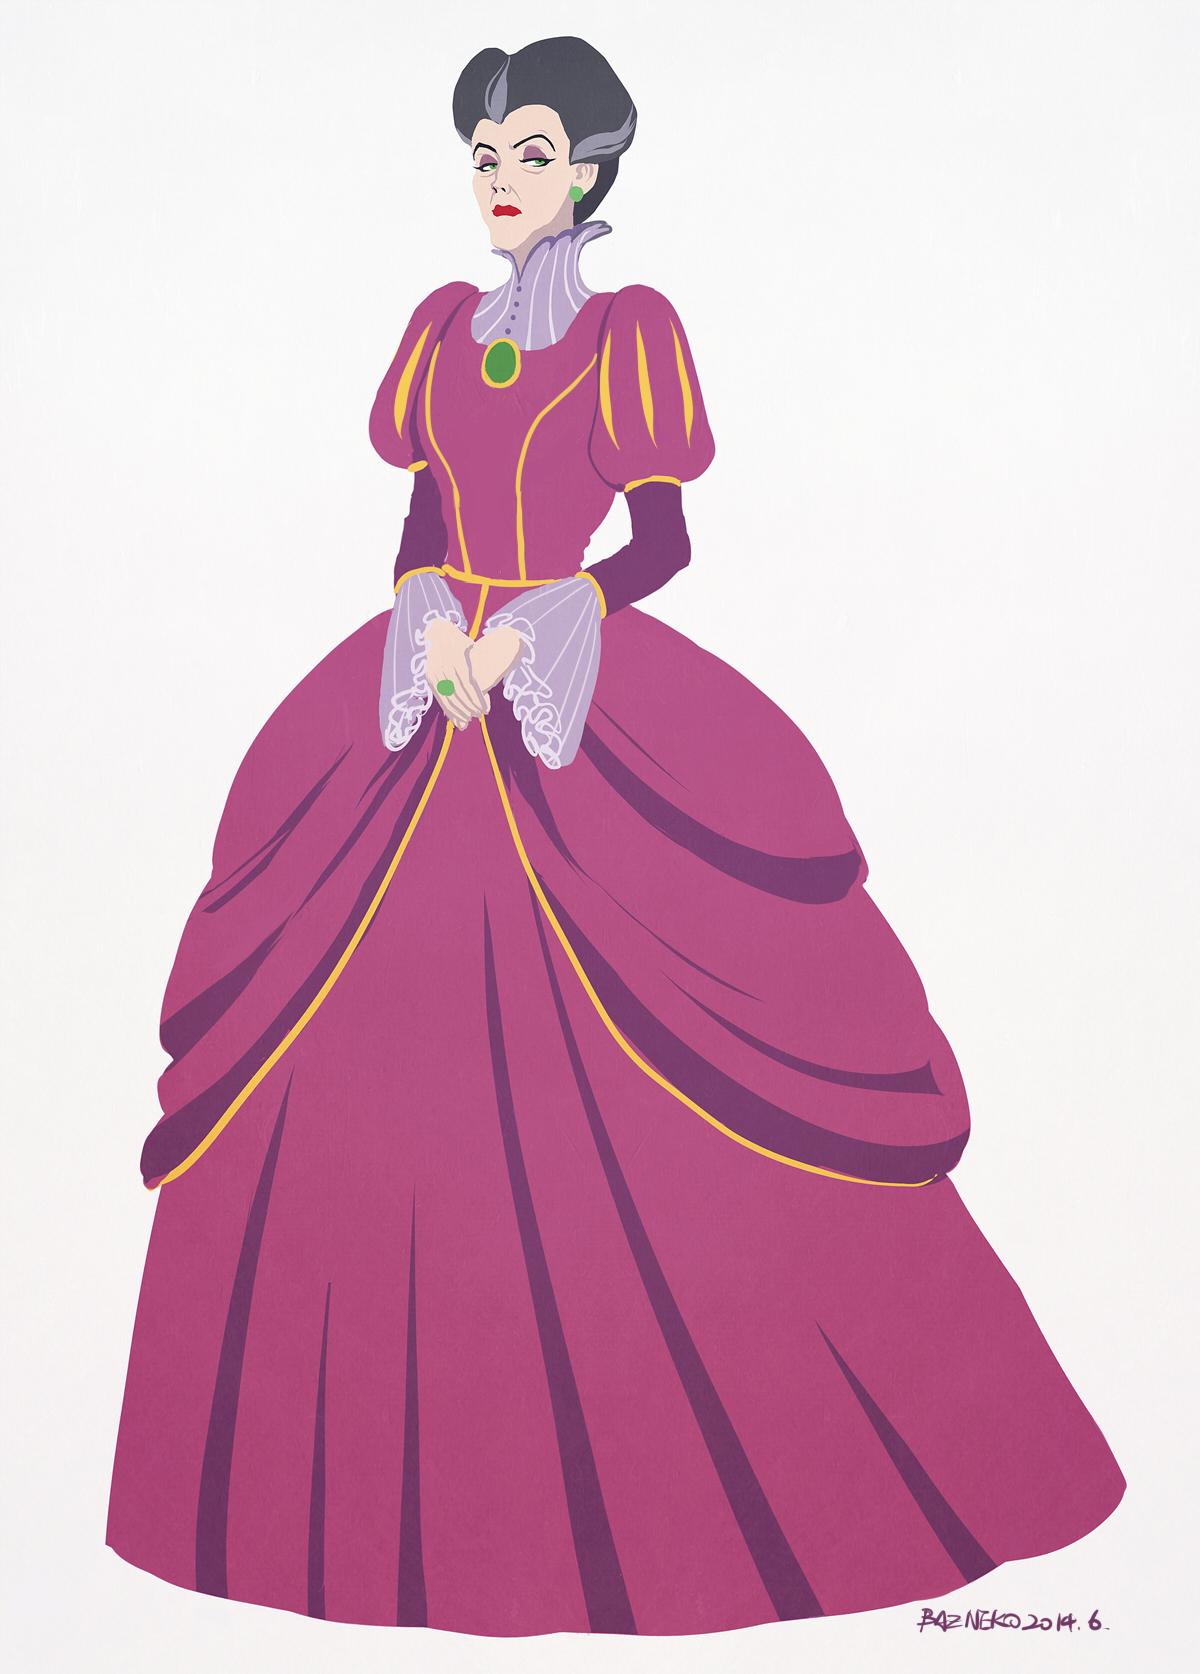 Lady Tremaine - Cinderella - Image #2186122 - Zerochan Anime Image Board